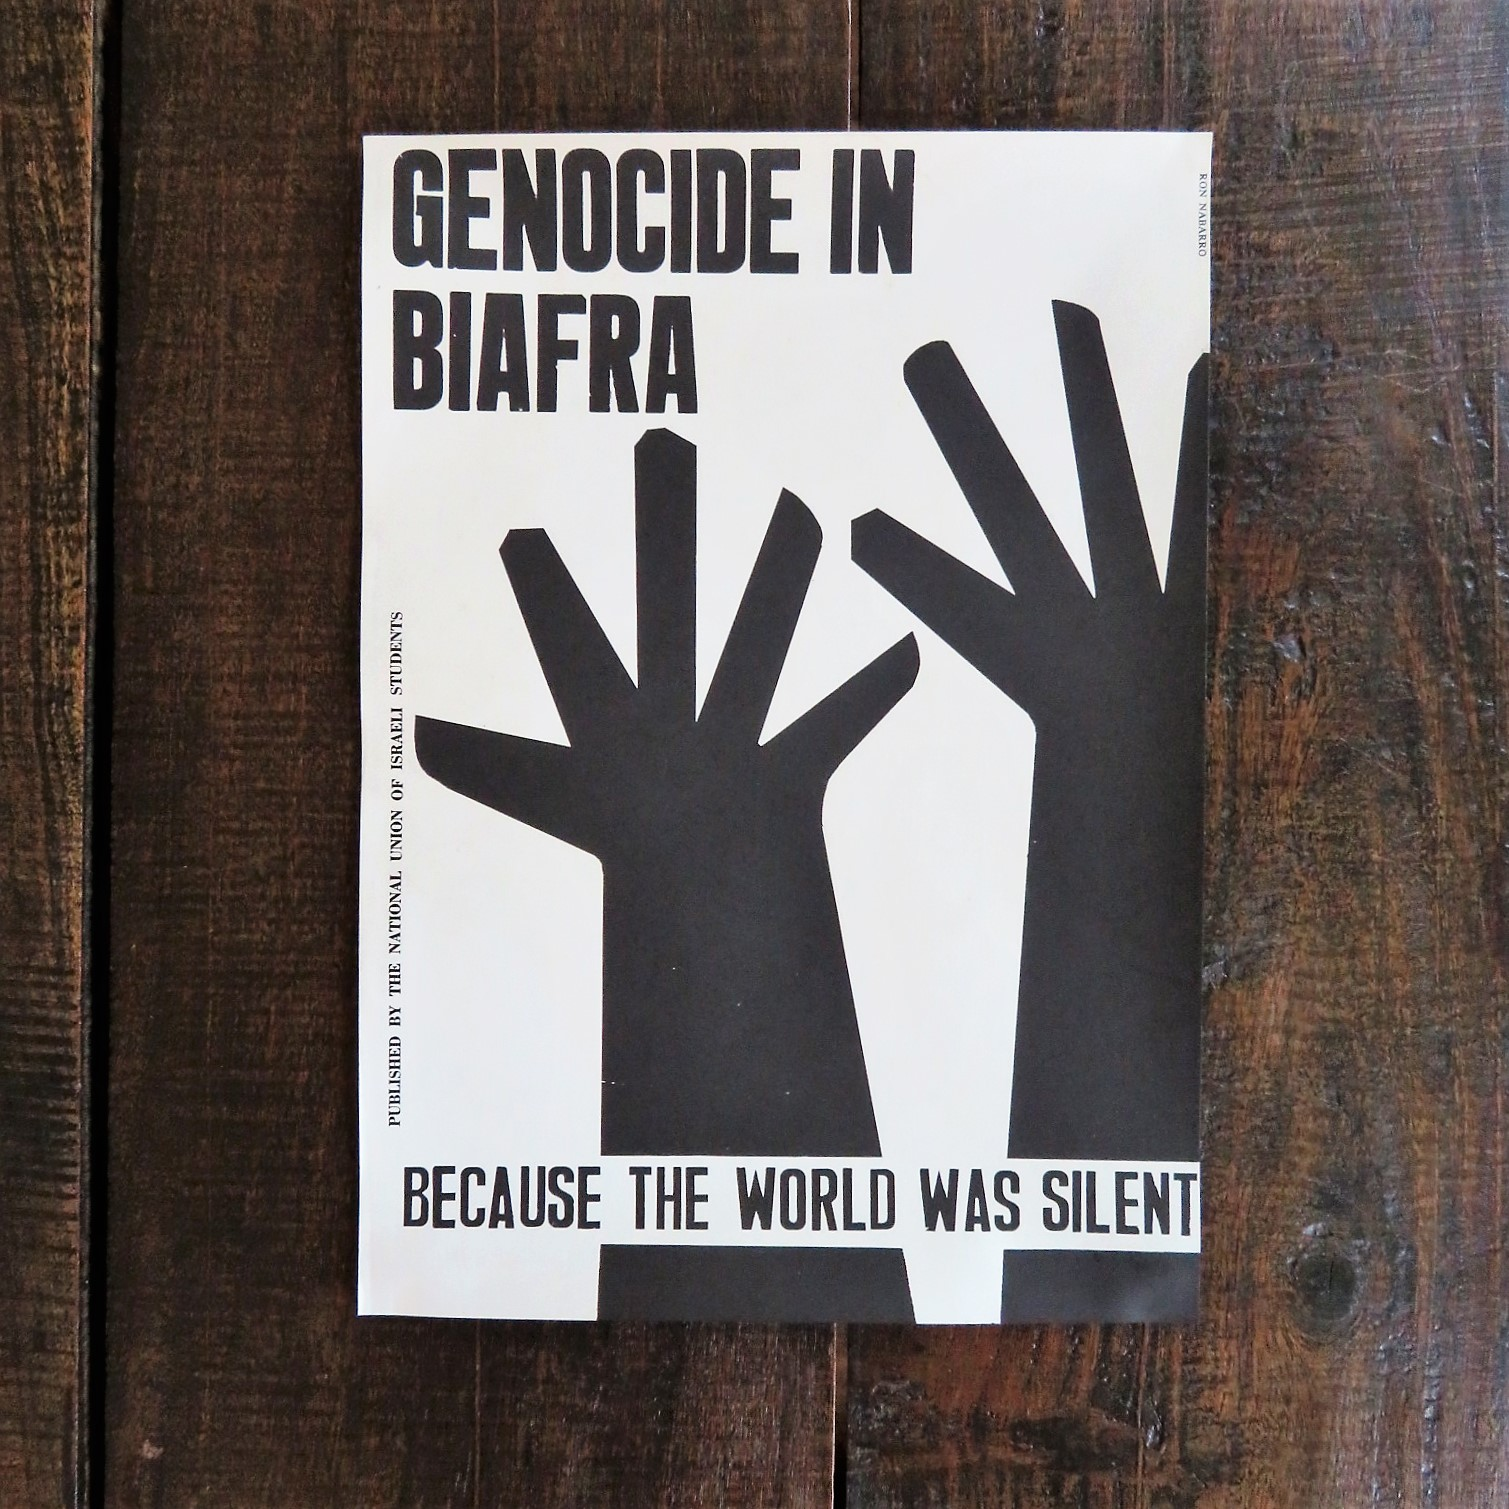 poster-genocide-in-biafra